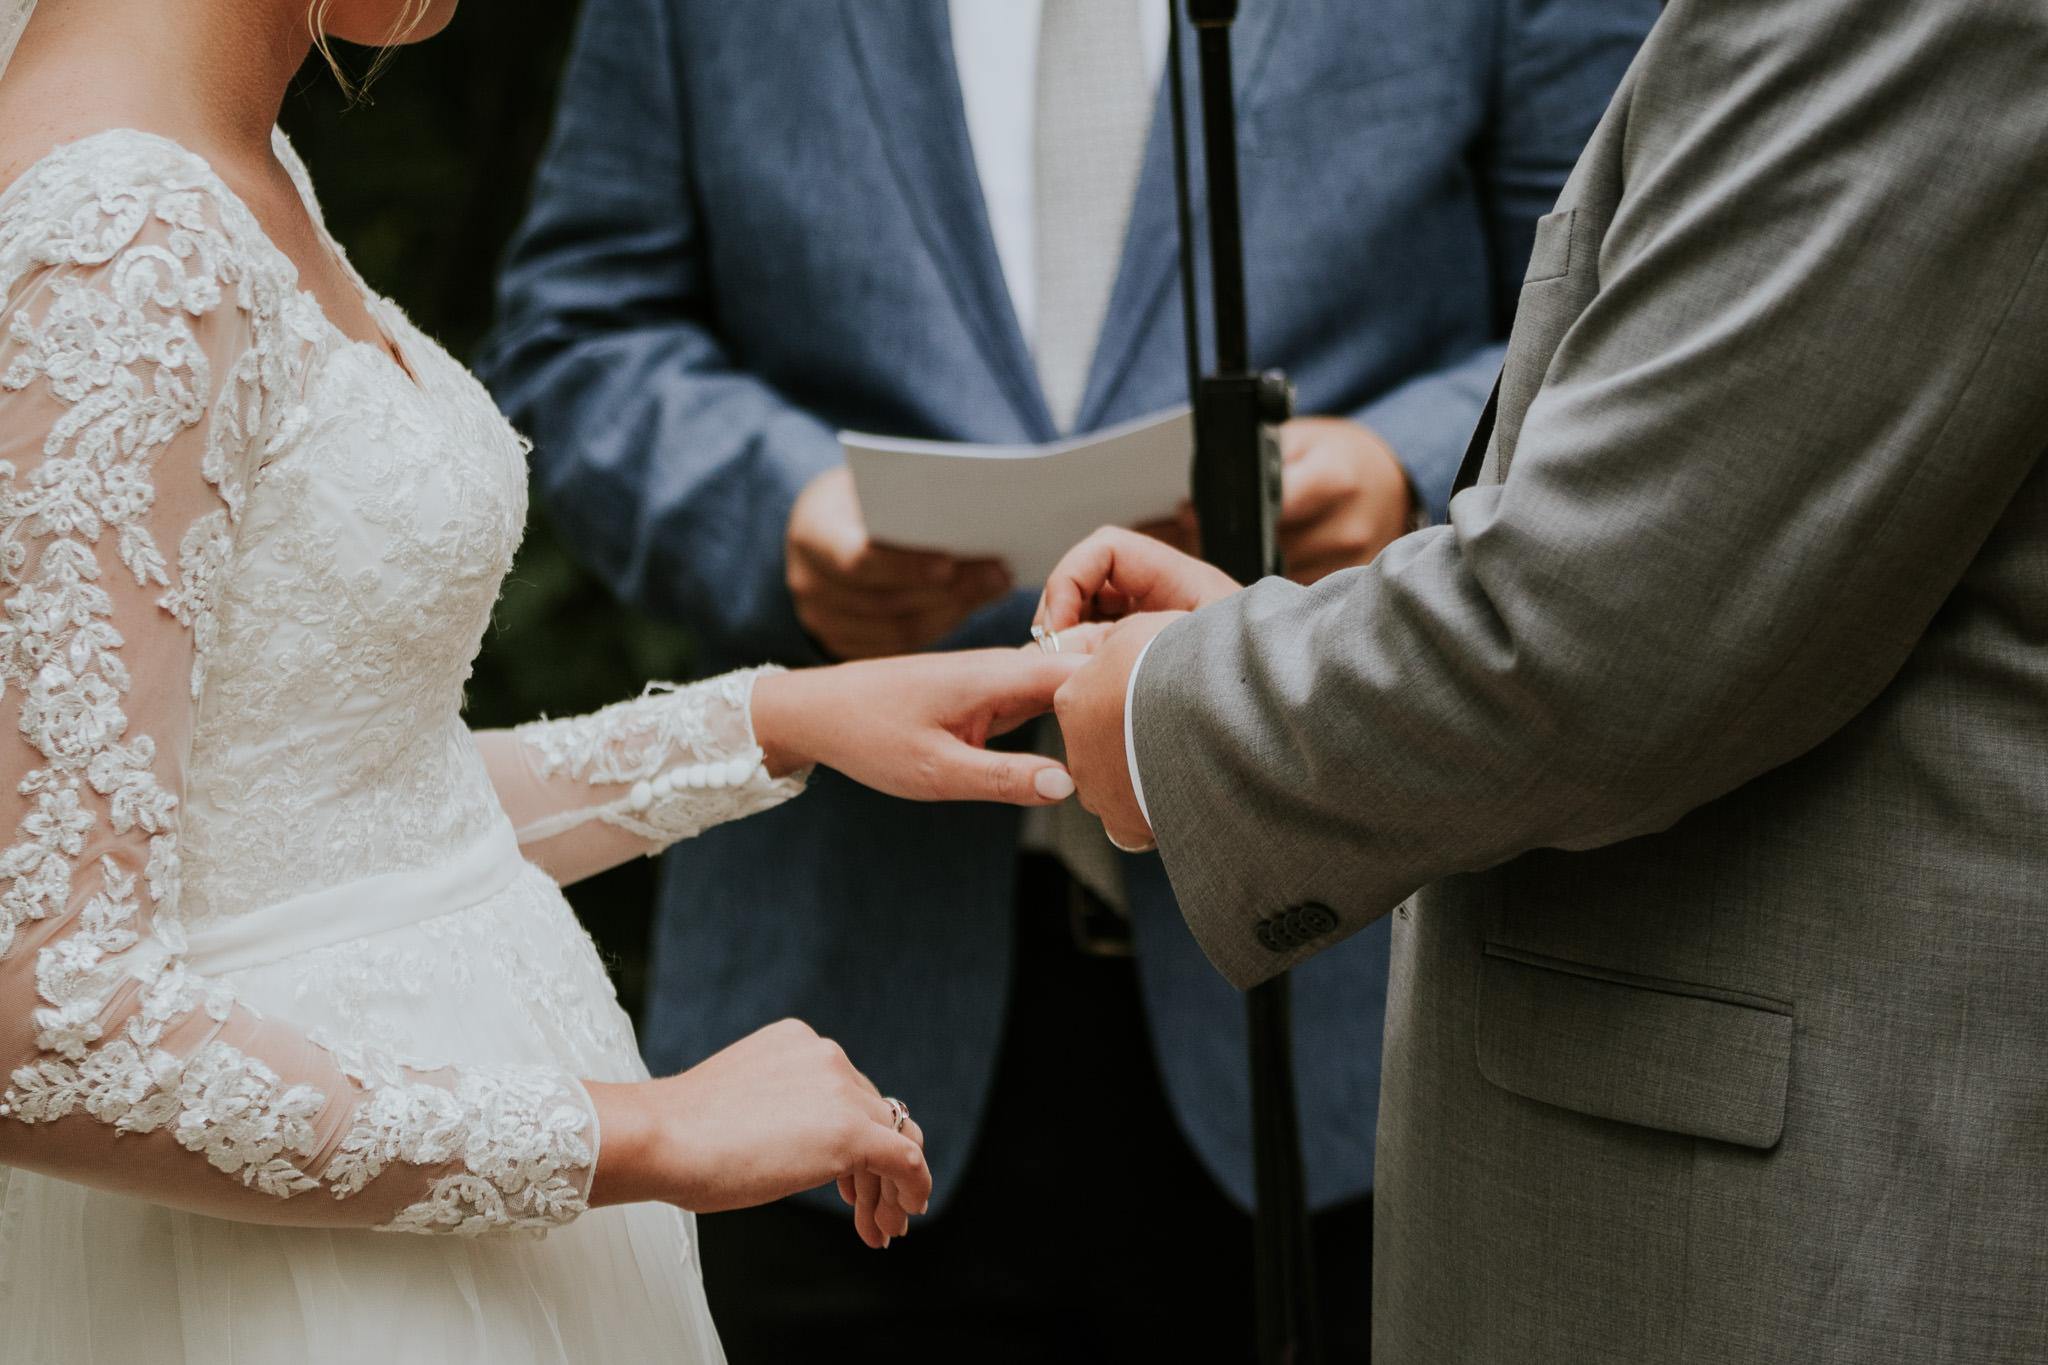 pine-ridge-golf-course-winnipeg-wedding-79.jpg